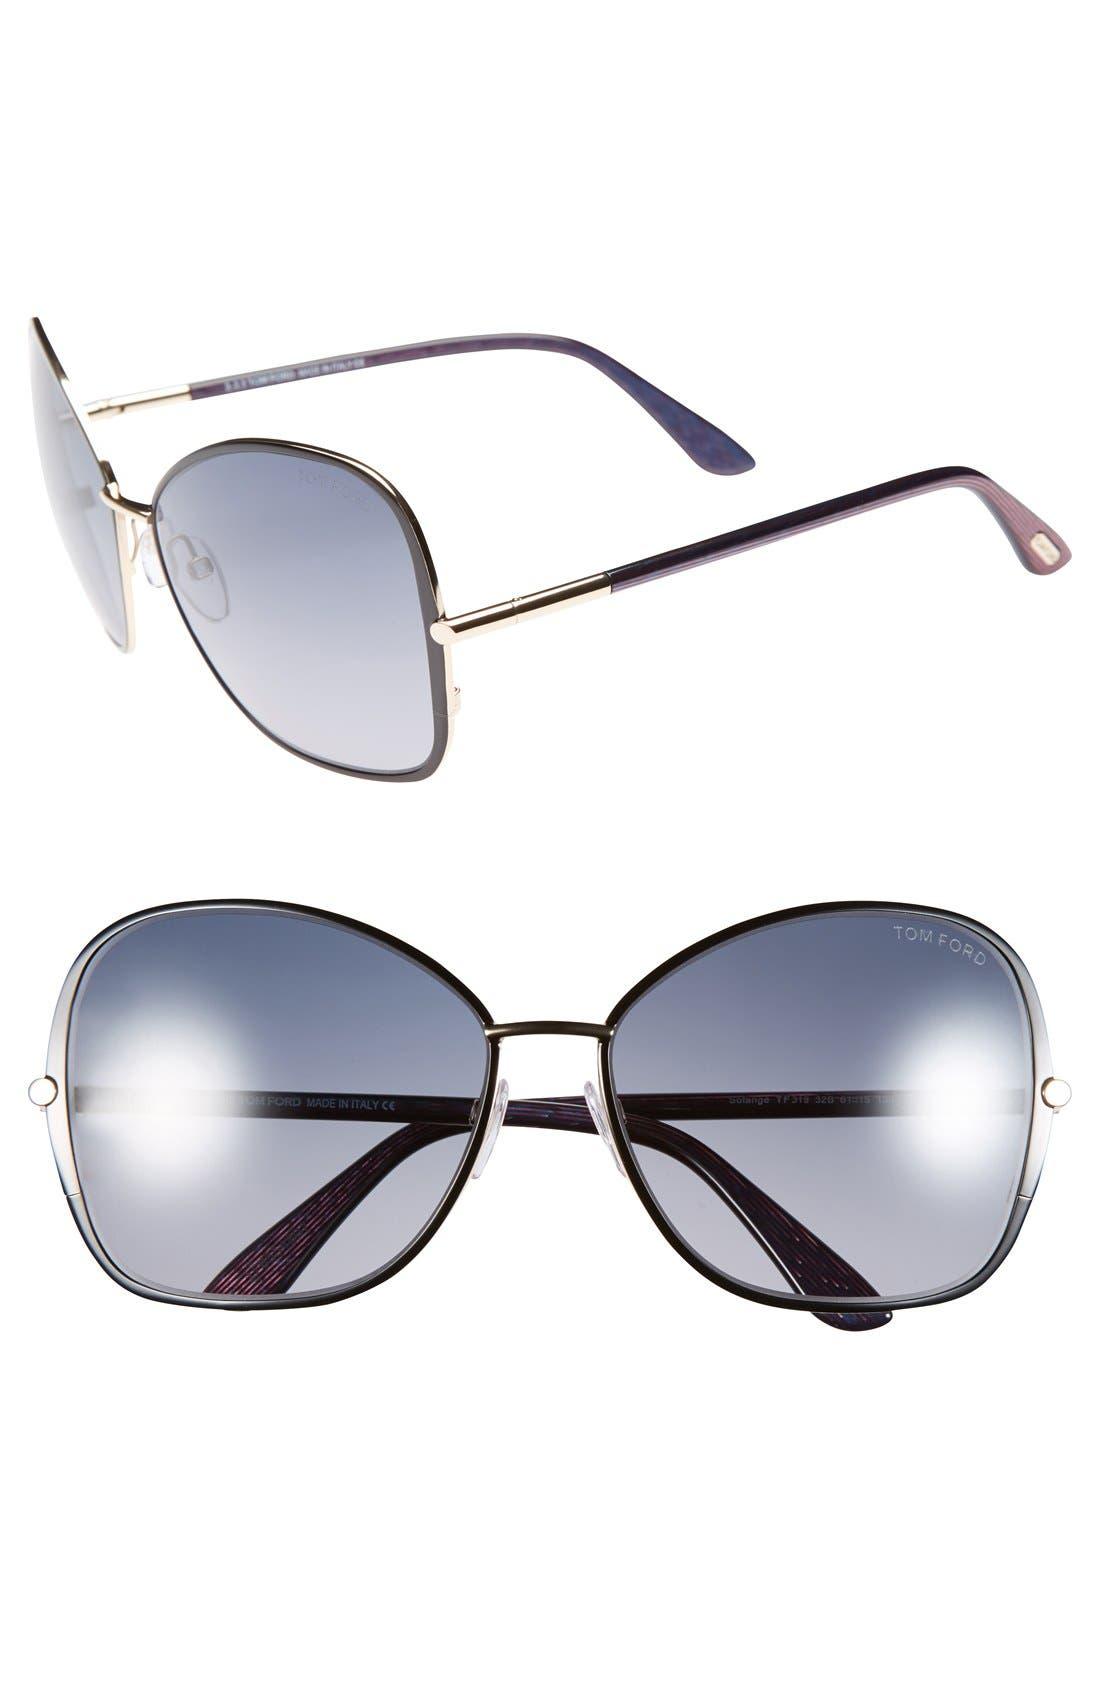 TOM FORD 'Solange' 61mm Sunglasses, Main, color, 001